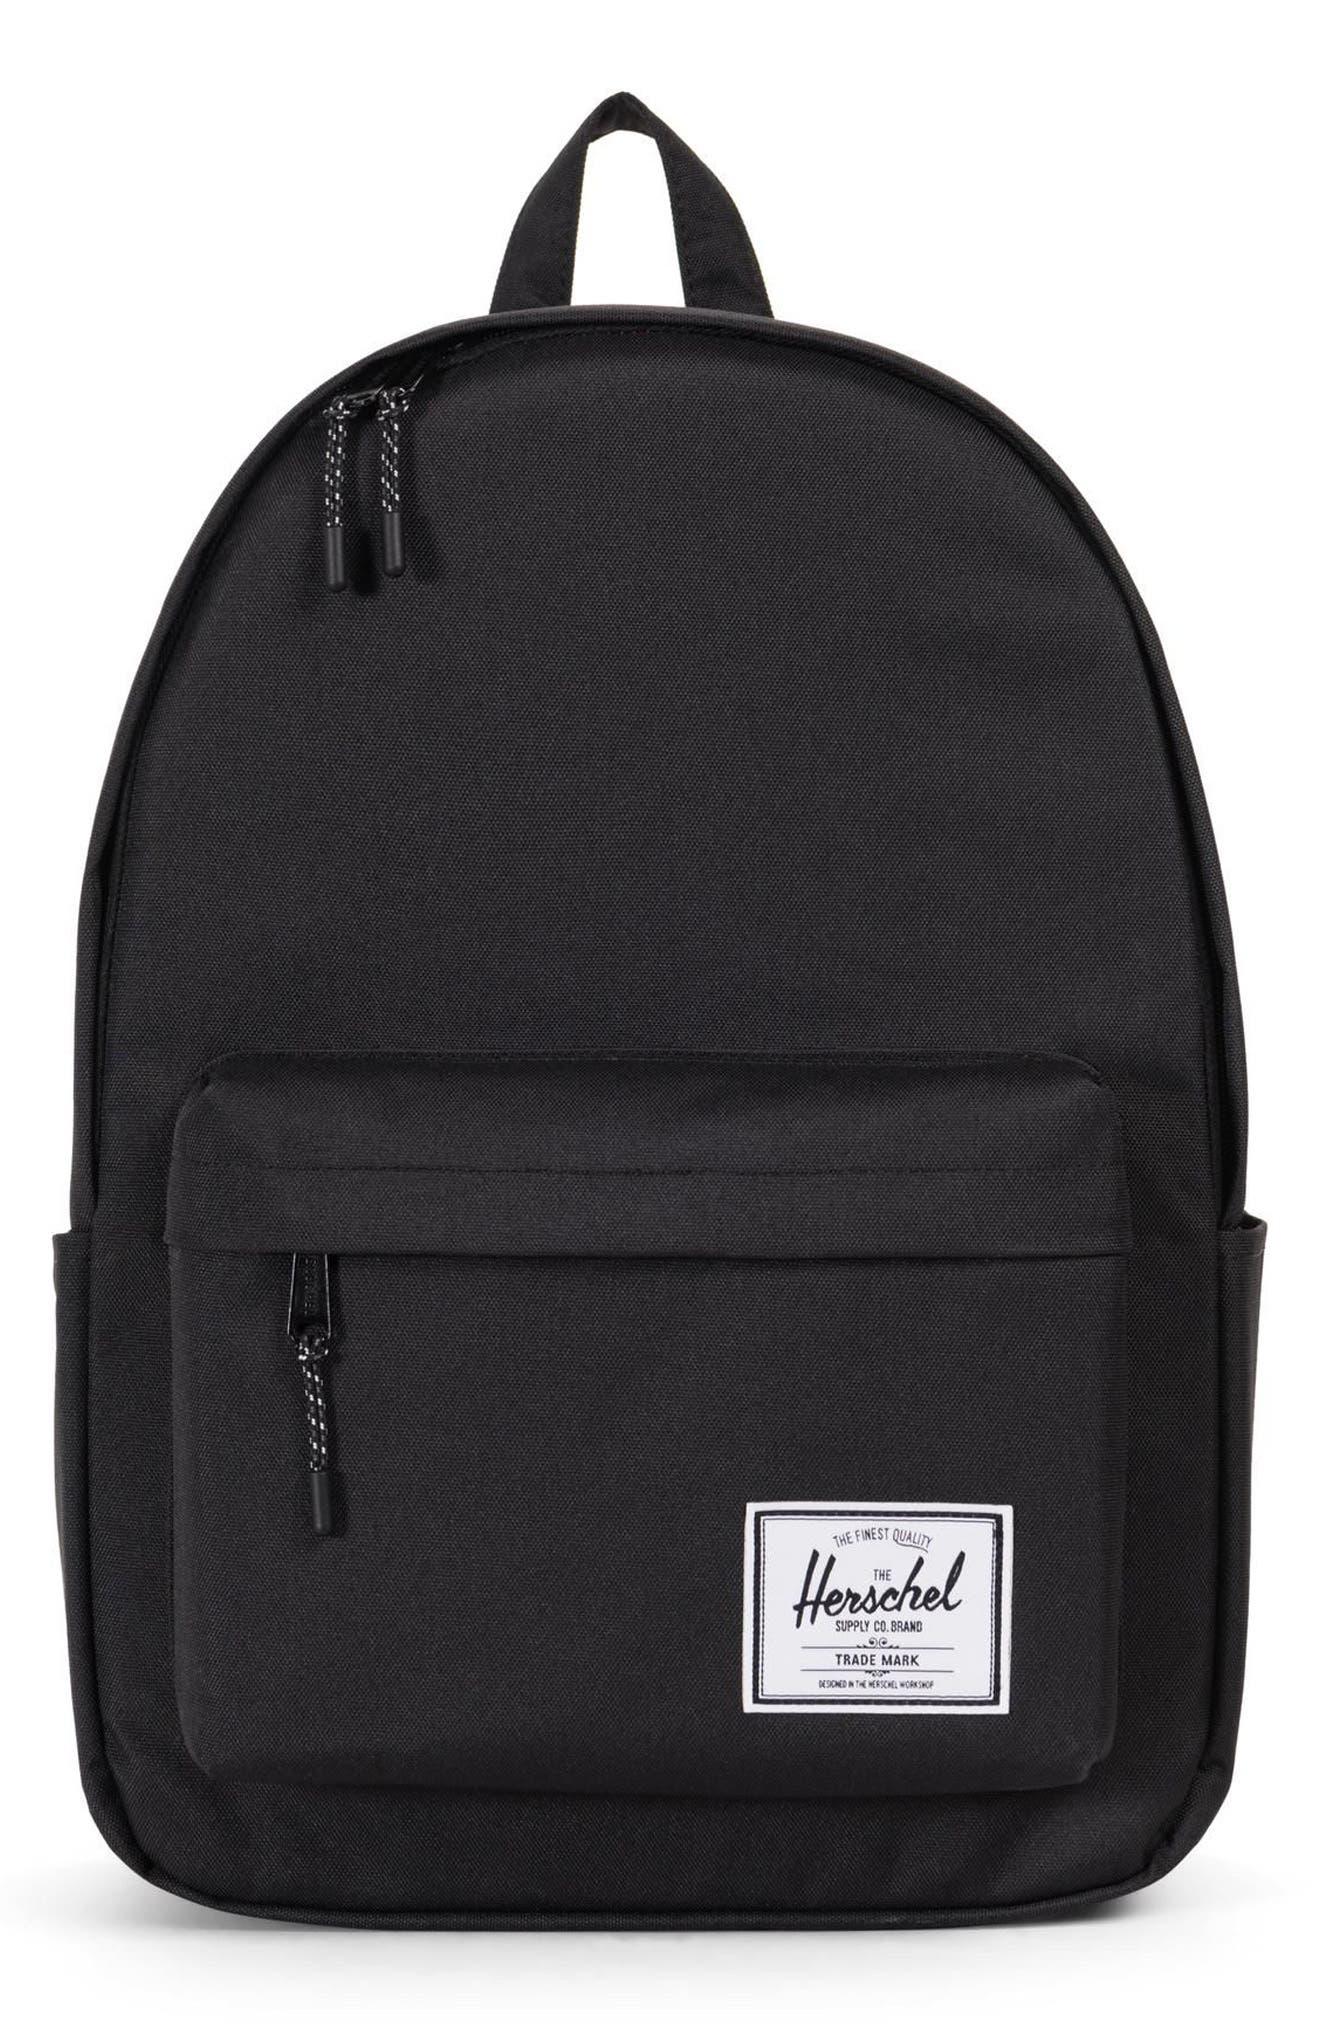 080a05377b3 Women s Herschel Supply Co. Backpacks